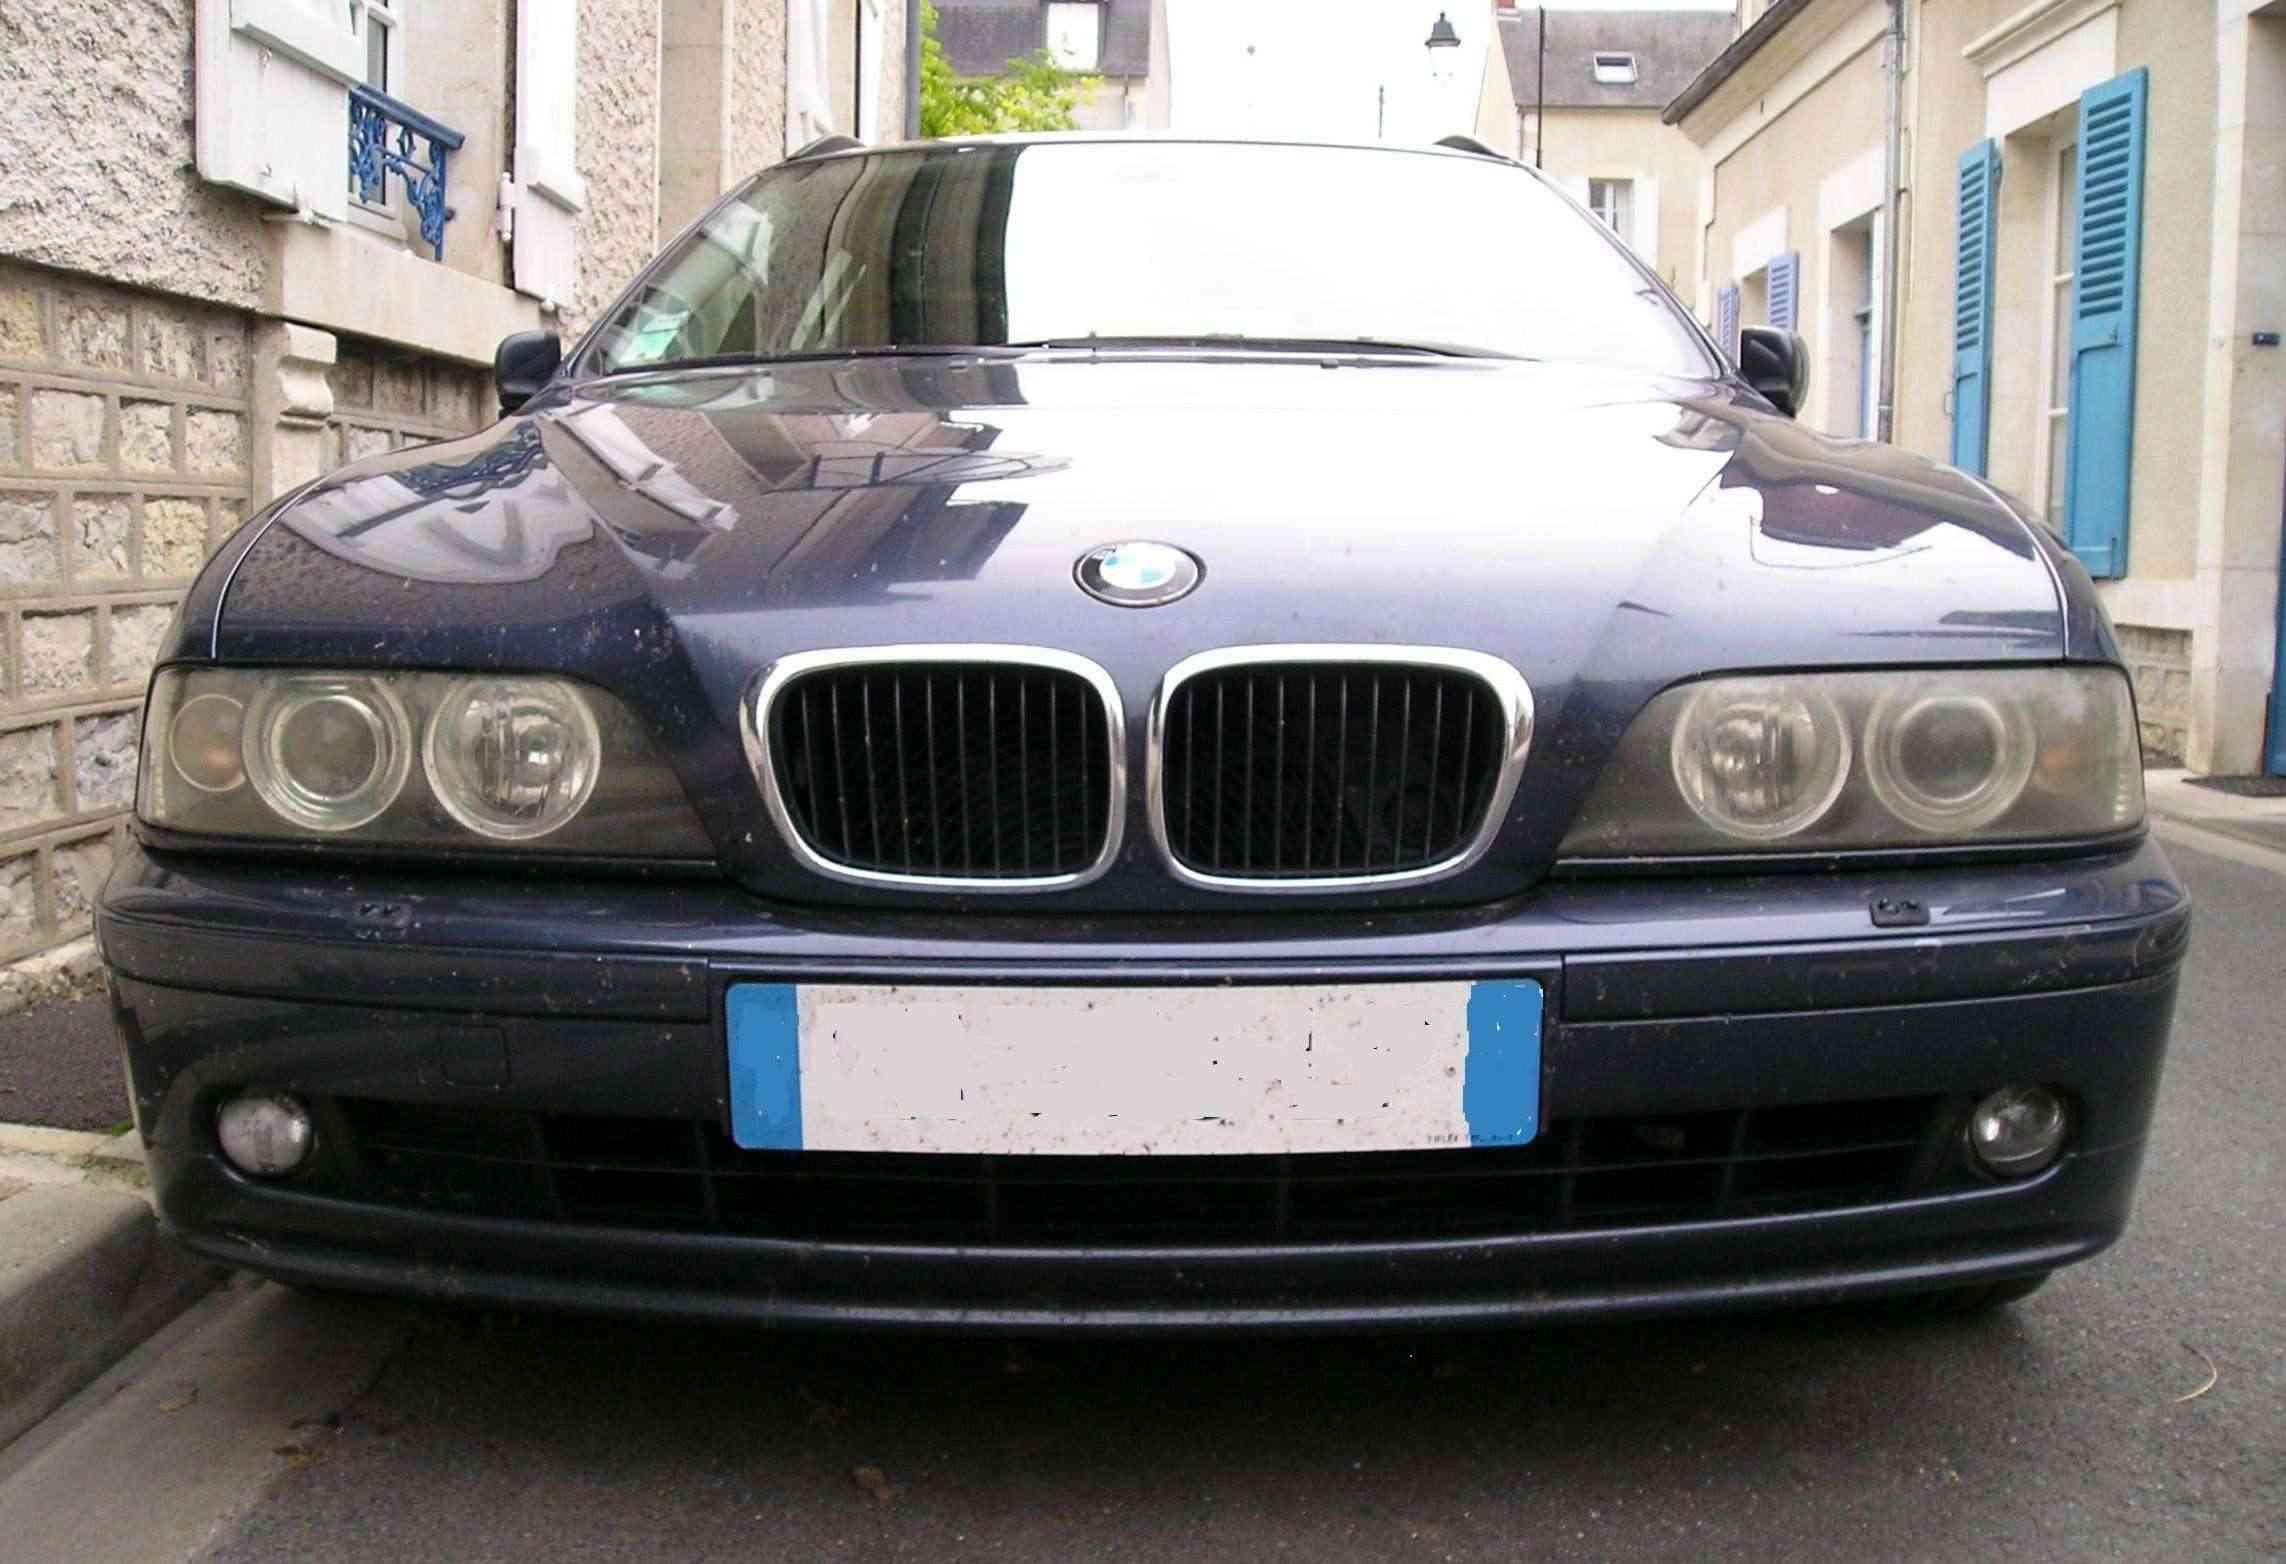 [BMW 530 d E39] Dunlop SP Sport Fast Response après 40000 km Bmw_5318